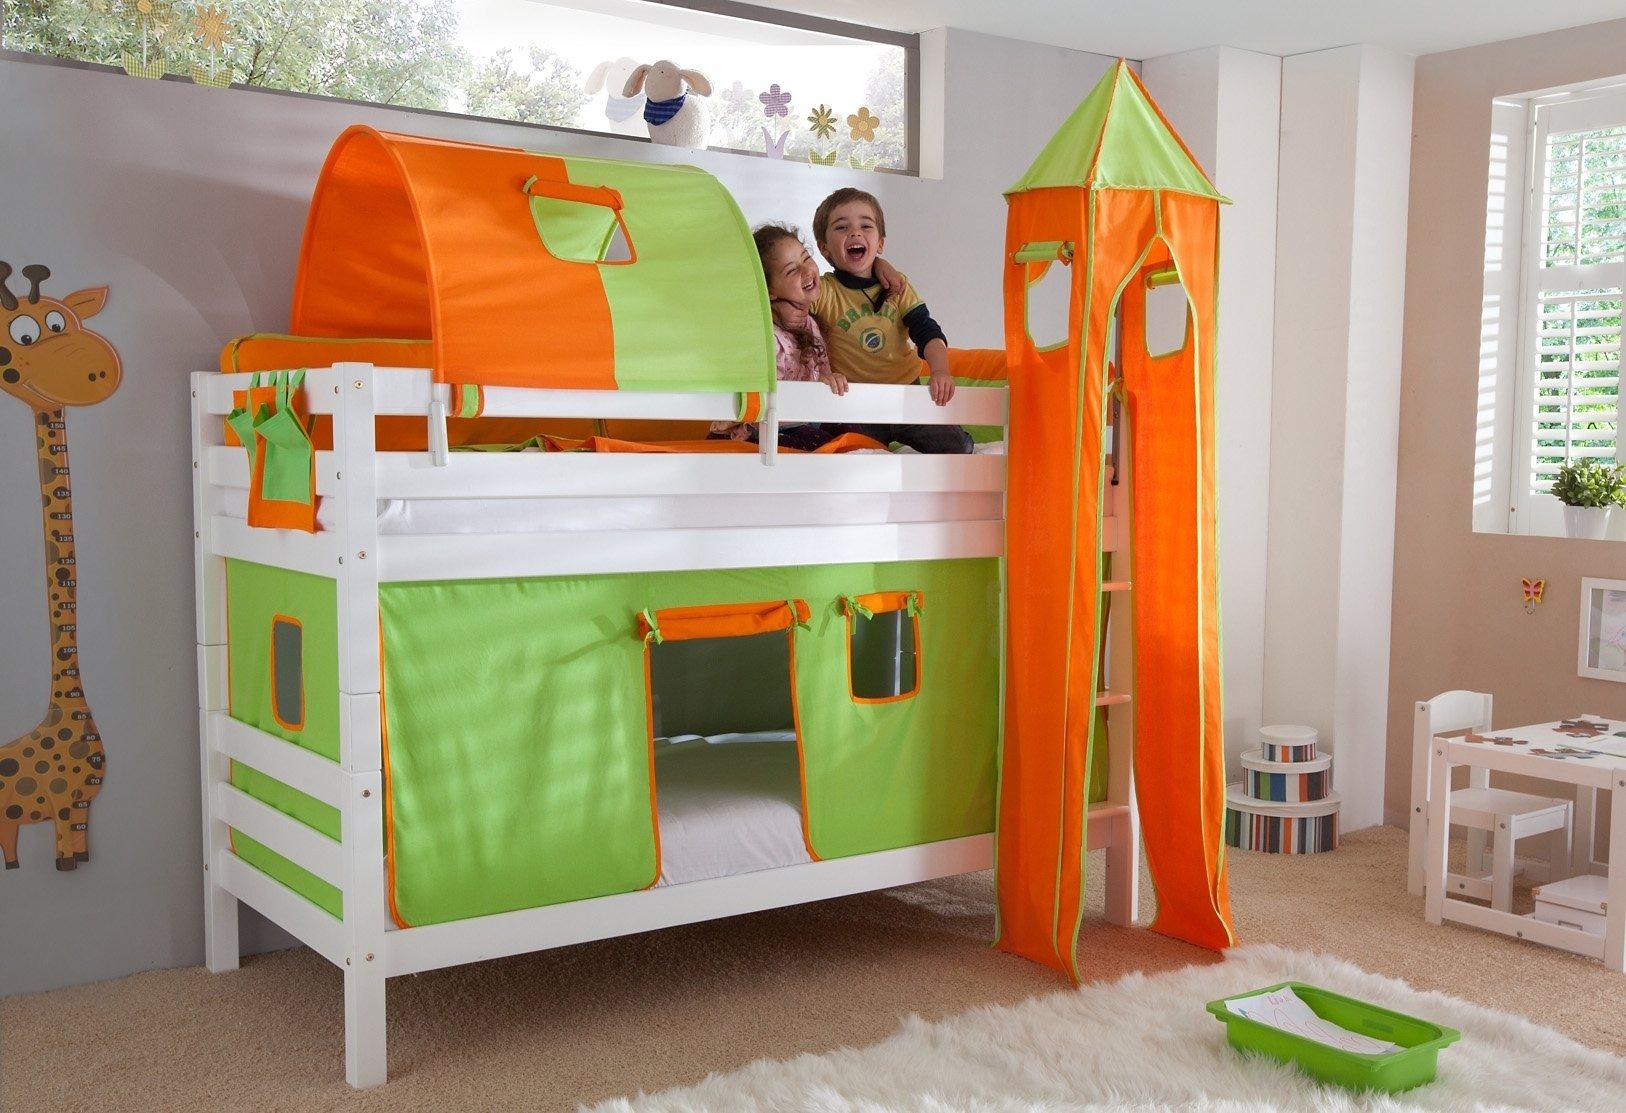 Relita Einzel-/Etagenbett, Set 4-tlg. | Kinderzimmer > Kinderbetten > Etagenbetten | Weiß | Massiver | Relita